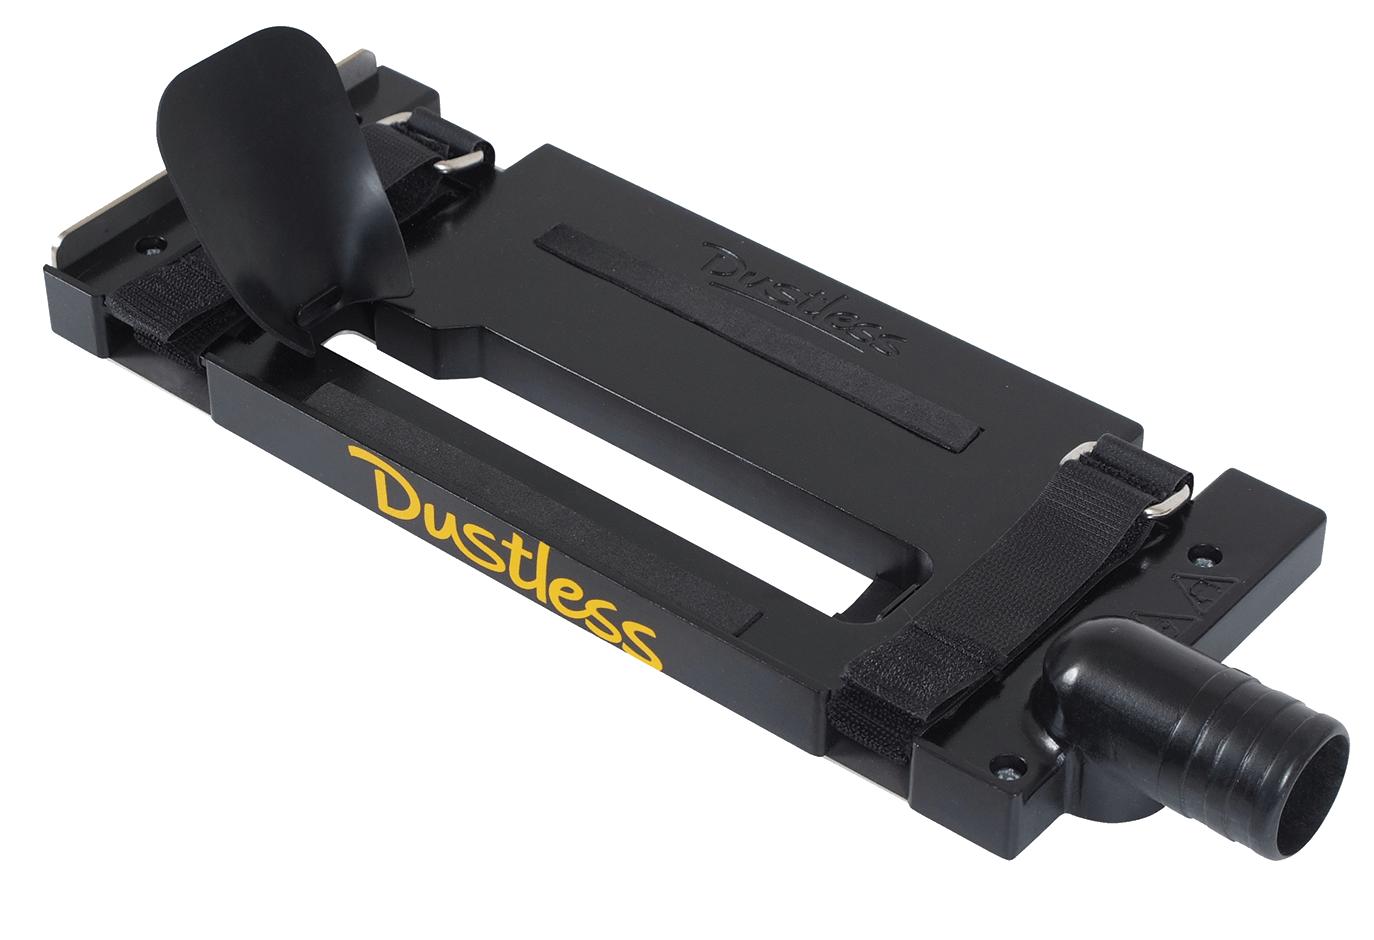 DustBuddie for Worm Drive Saws - D4000